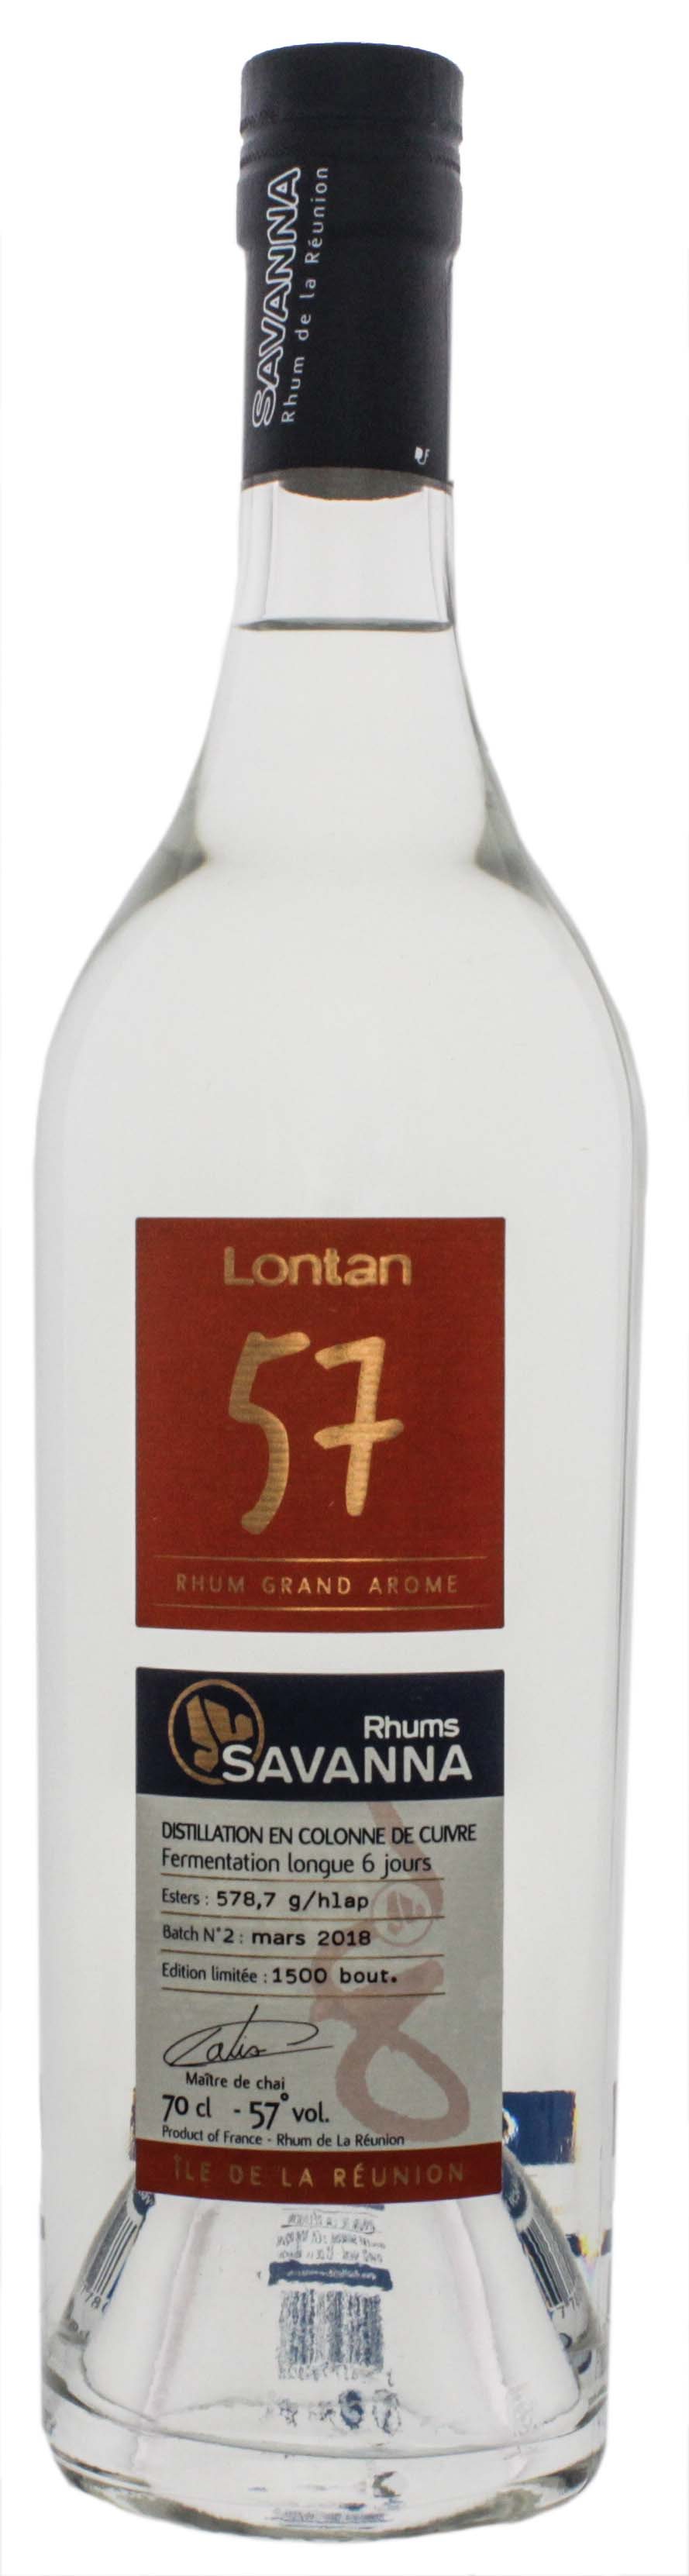 Savanna Lontan 57 Rum Blanc 0,7L 57%